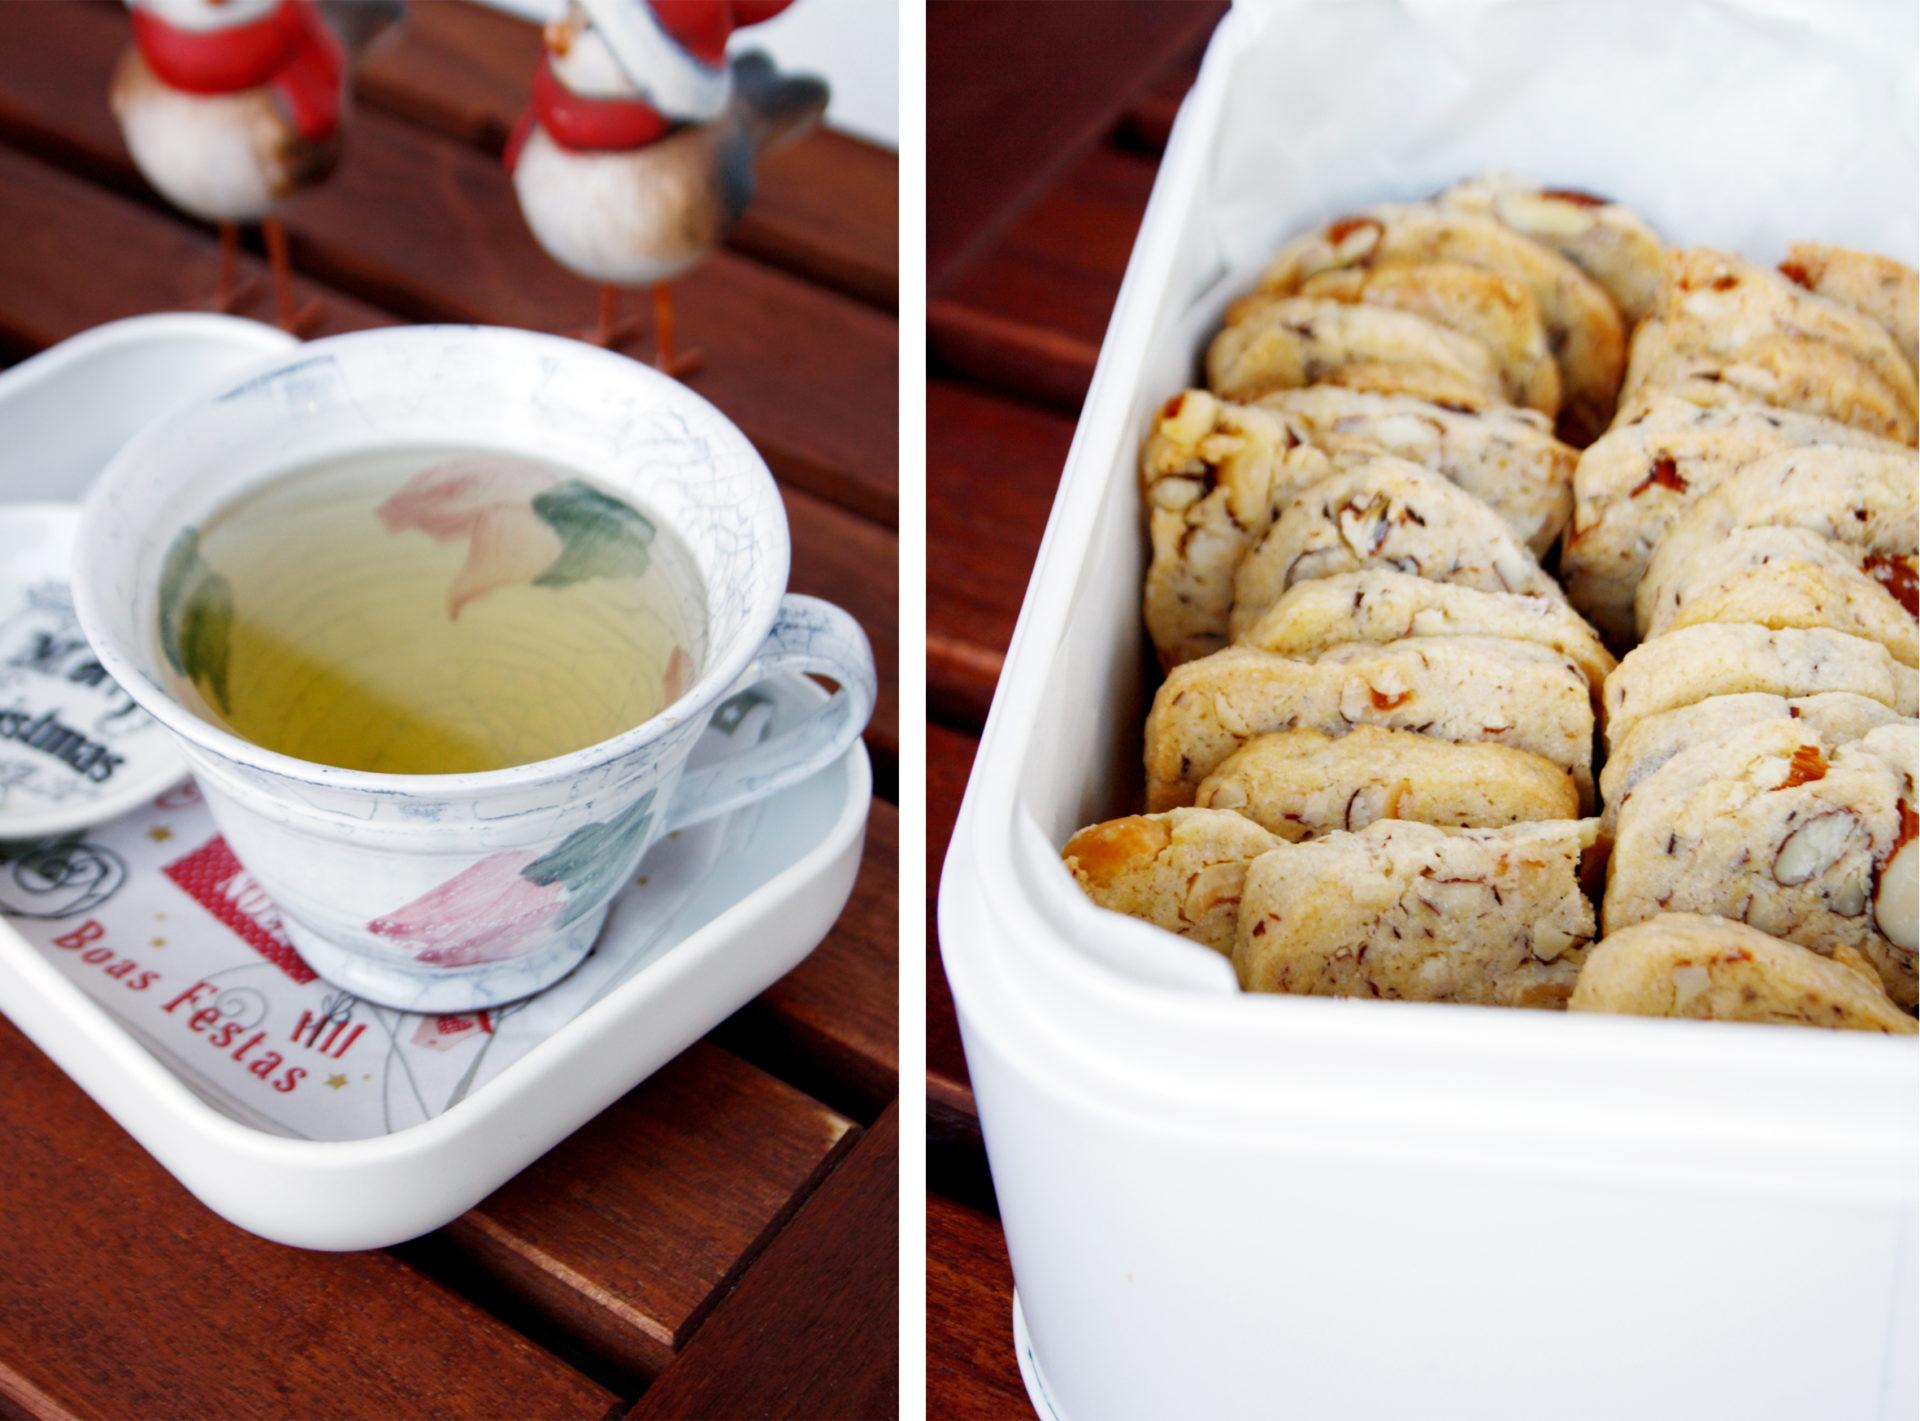 Schweizer Nusstaler // Swiss Cookies with Nuts by http://babyrockmyday.com/schweizer-nusstaler/